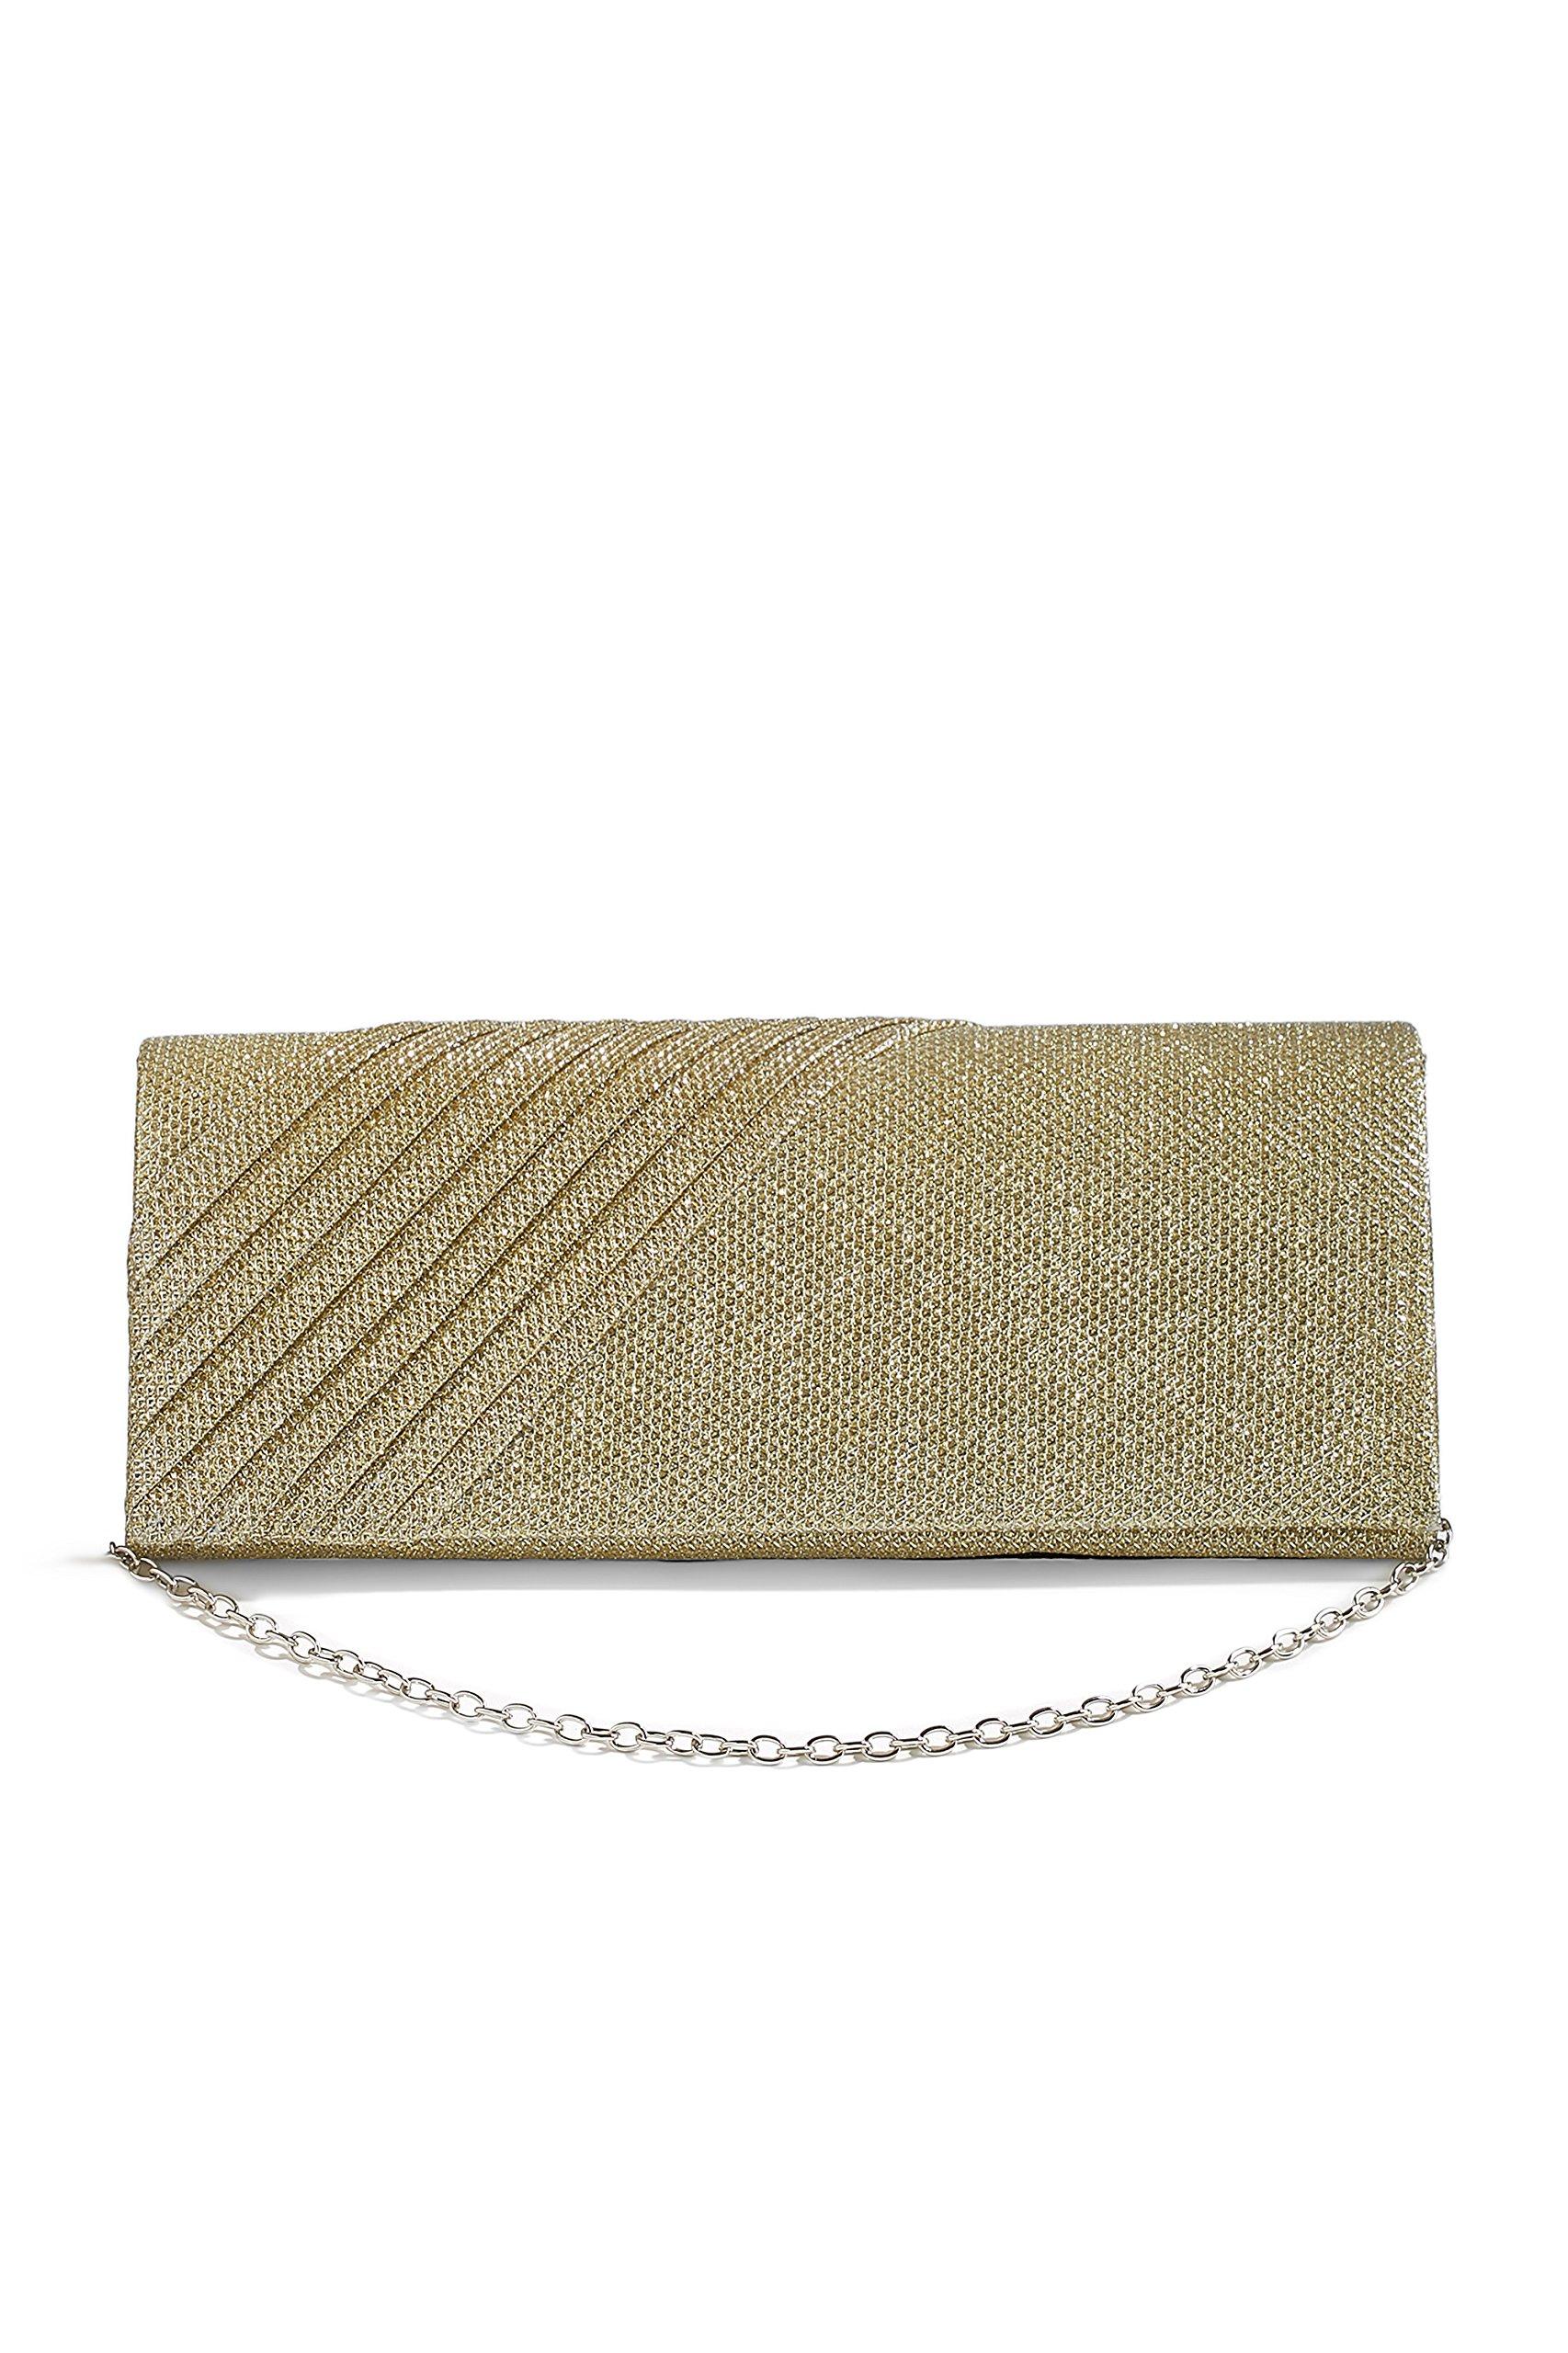 Women Long Clutch Purse Glitter Mesh Evening Bag Foldover Handbag With Chain Strap (beige, gold)